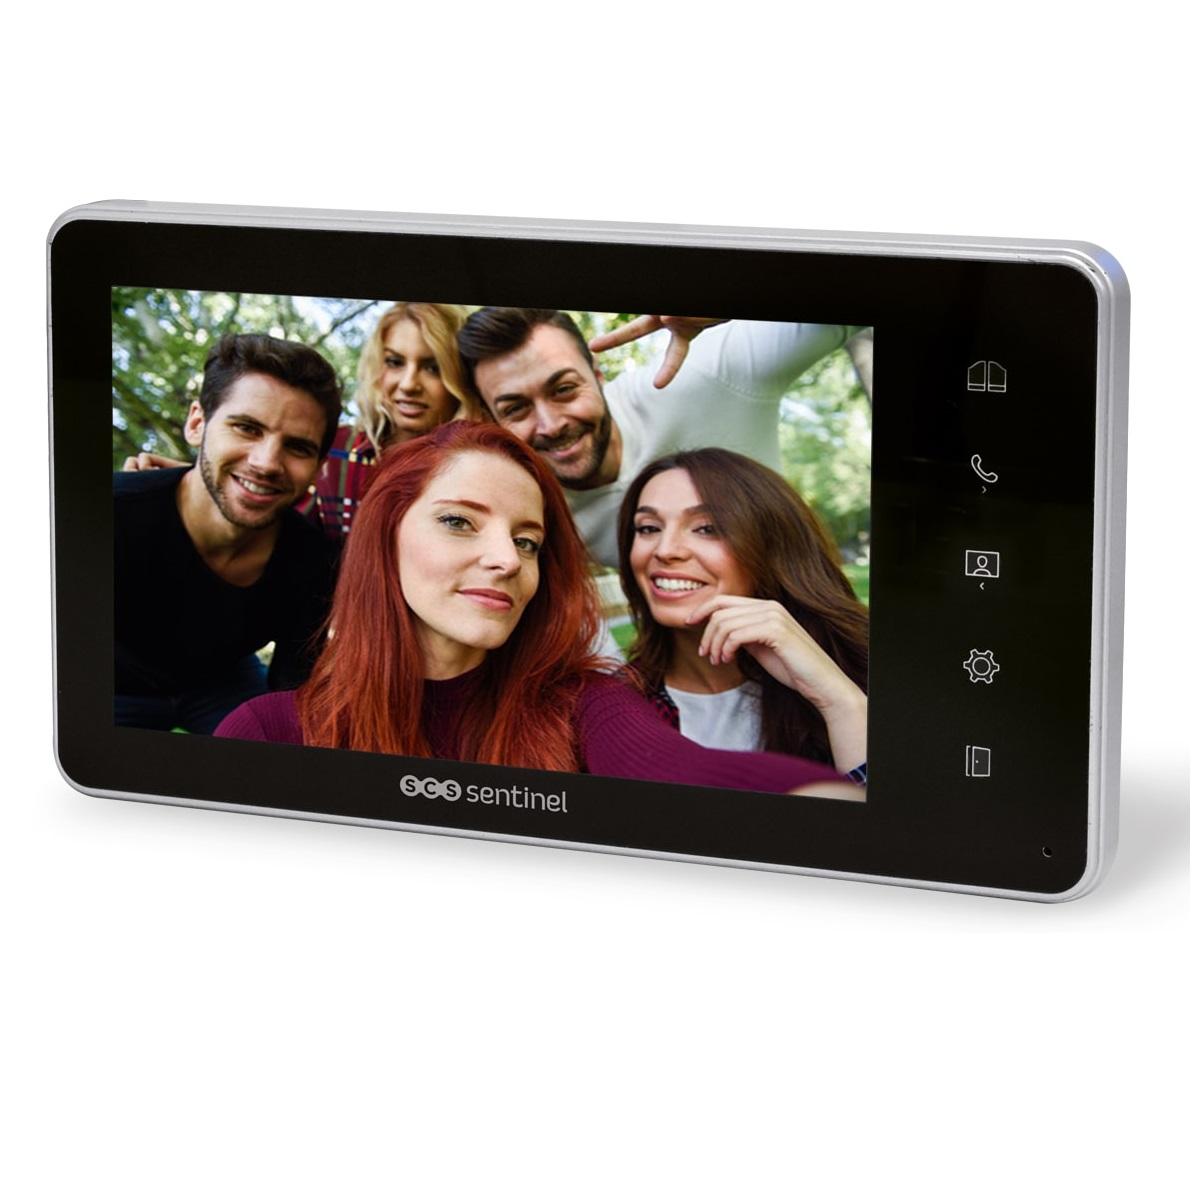 Monitor suplimentar pentru interfon SCS Sentinel VisioKit 7, Display 7 inch TFT LCD, 10 Melodii imagine case-smart.ro 2021